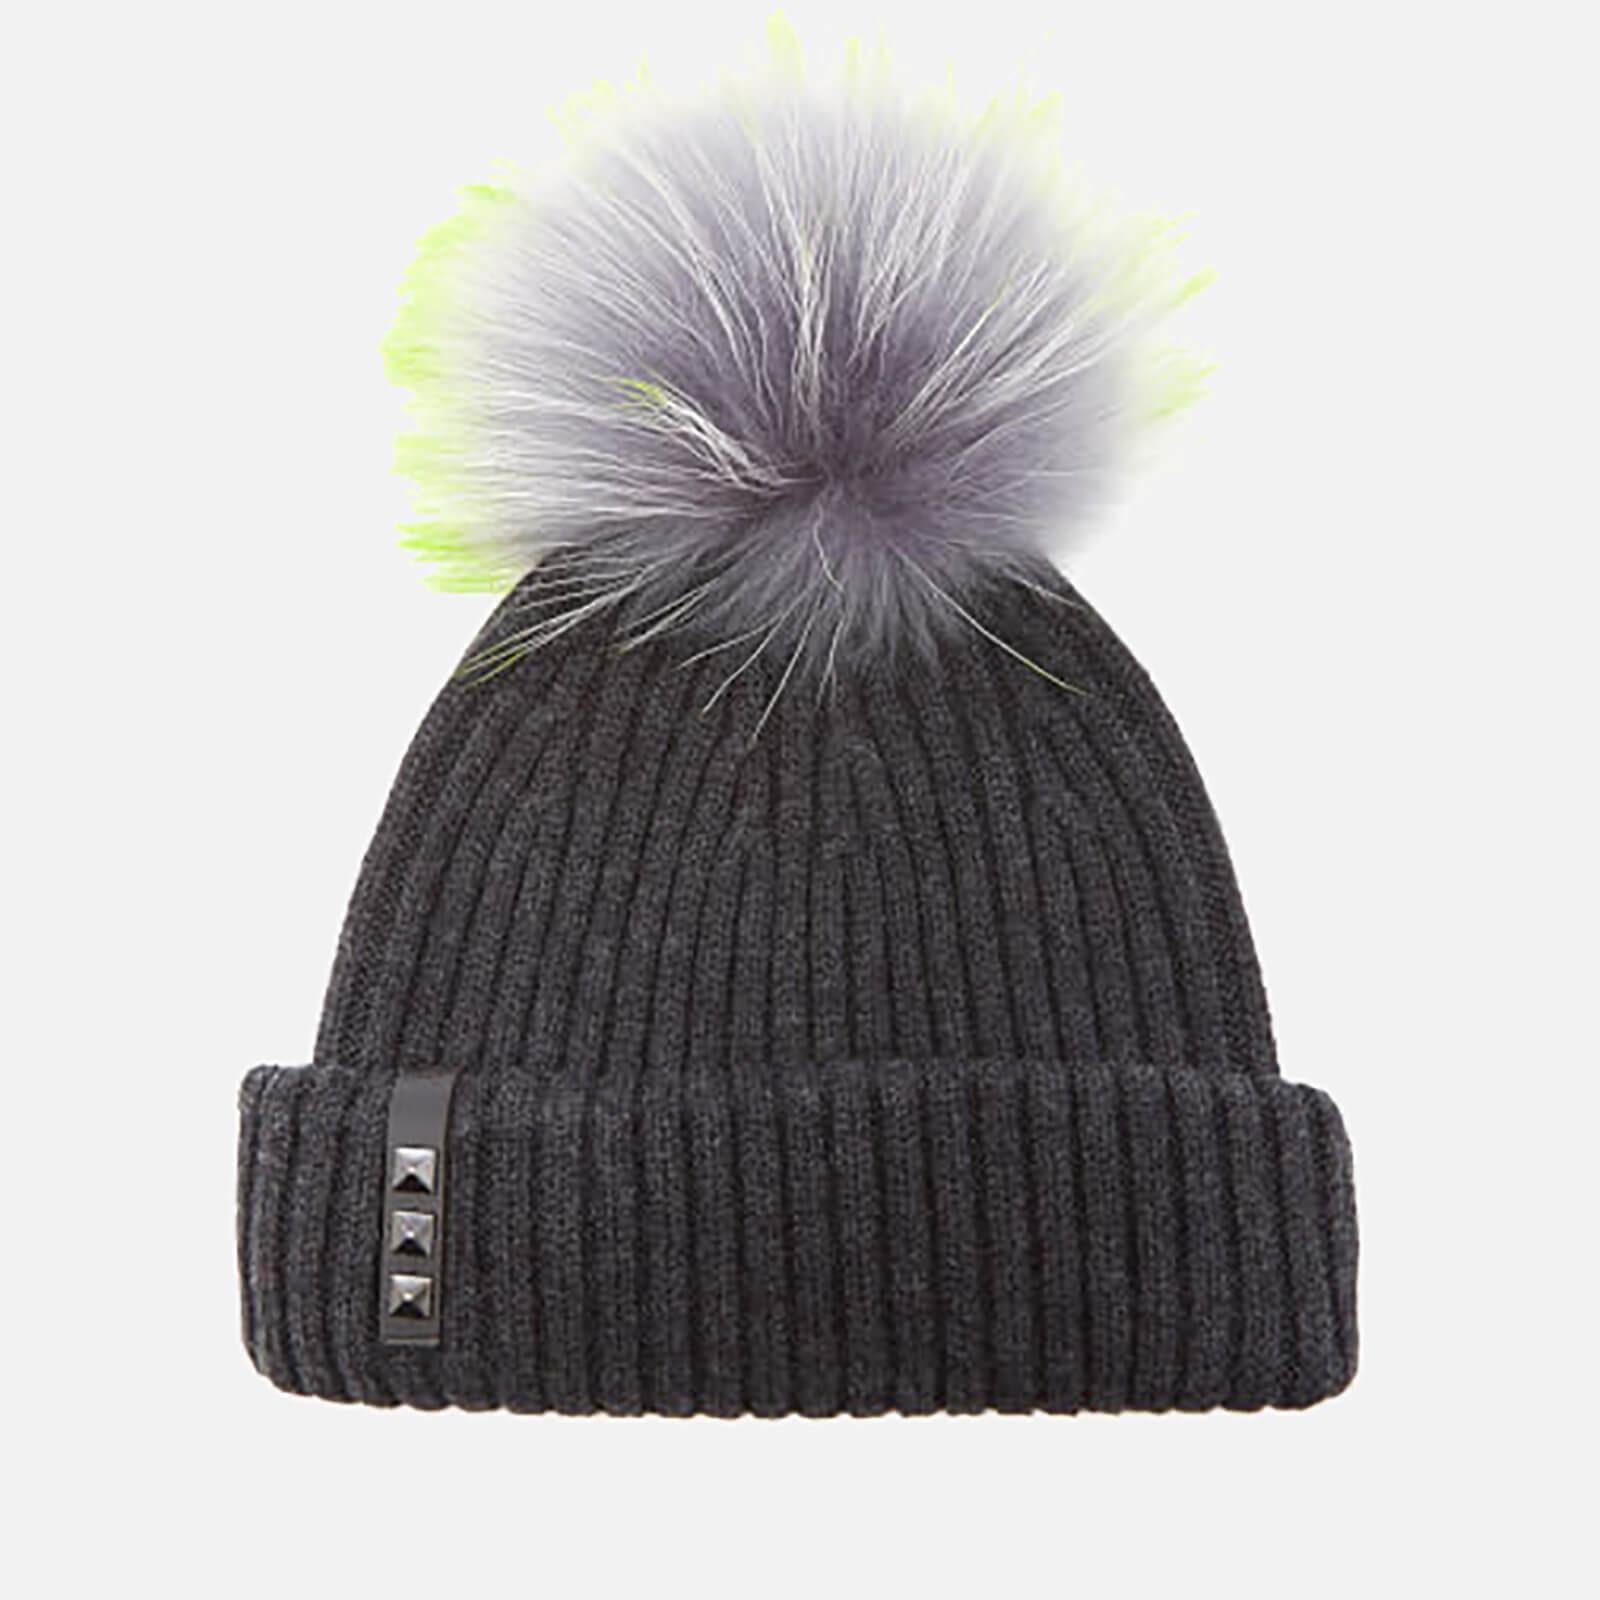 365f01a74fab3 BKLYN Women s Merino Wool Hat with Grey Lime Pom Pom - Charcoal Womens  Accessories